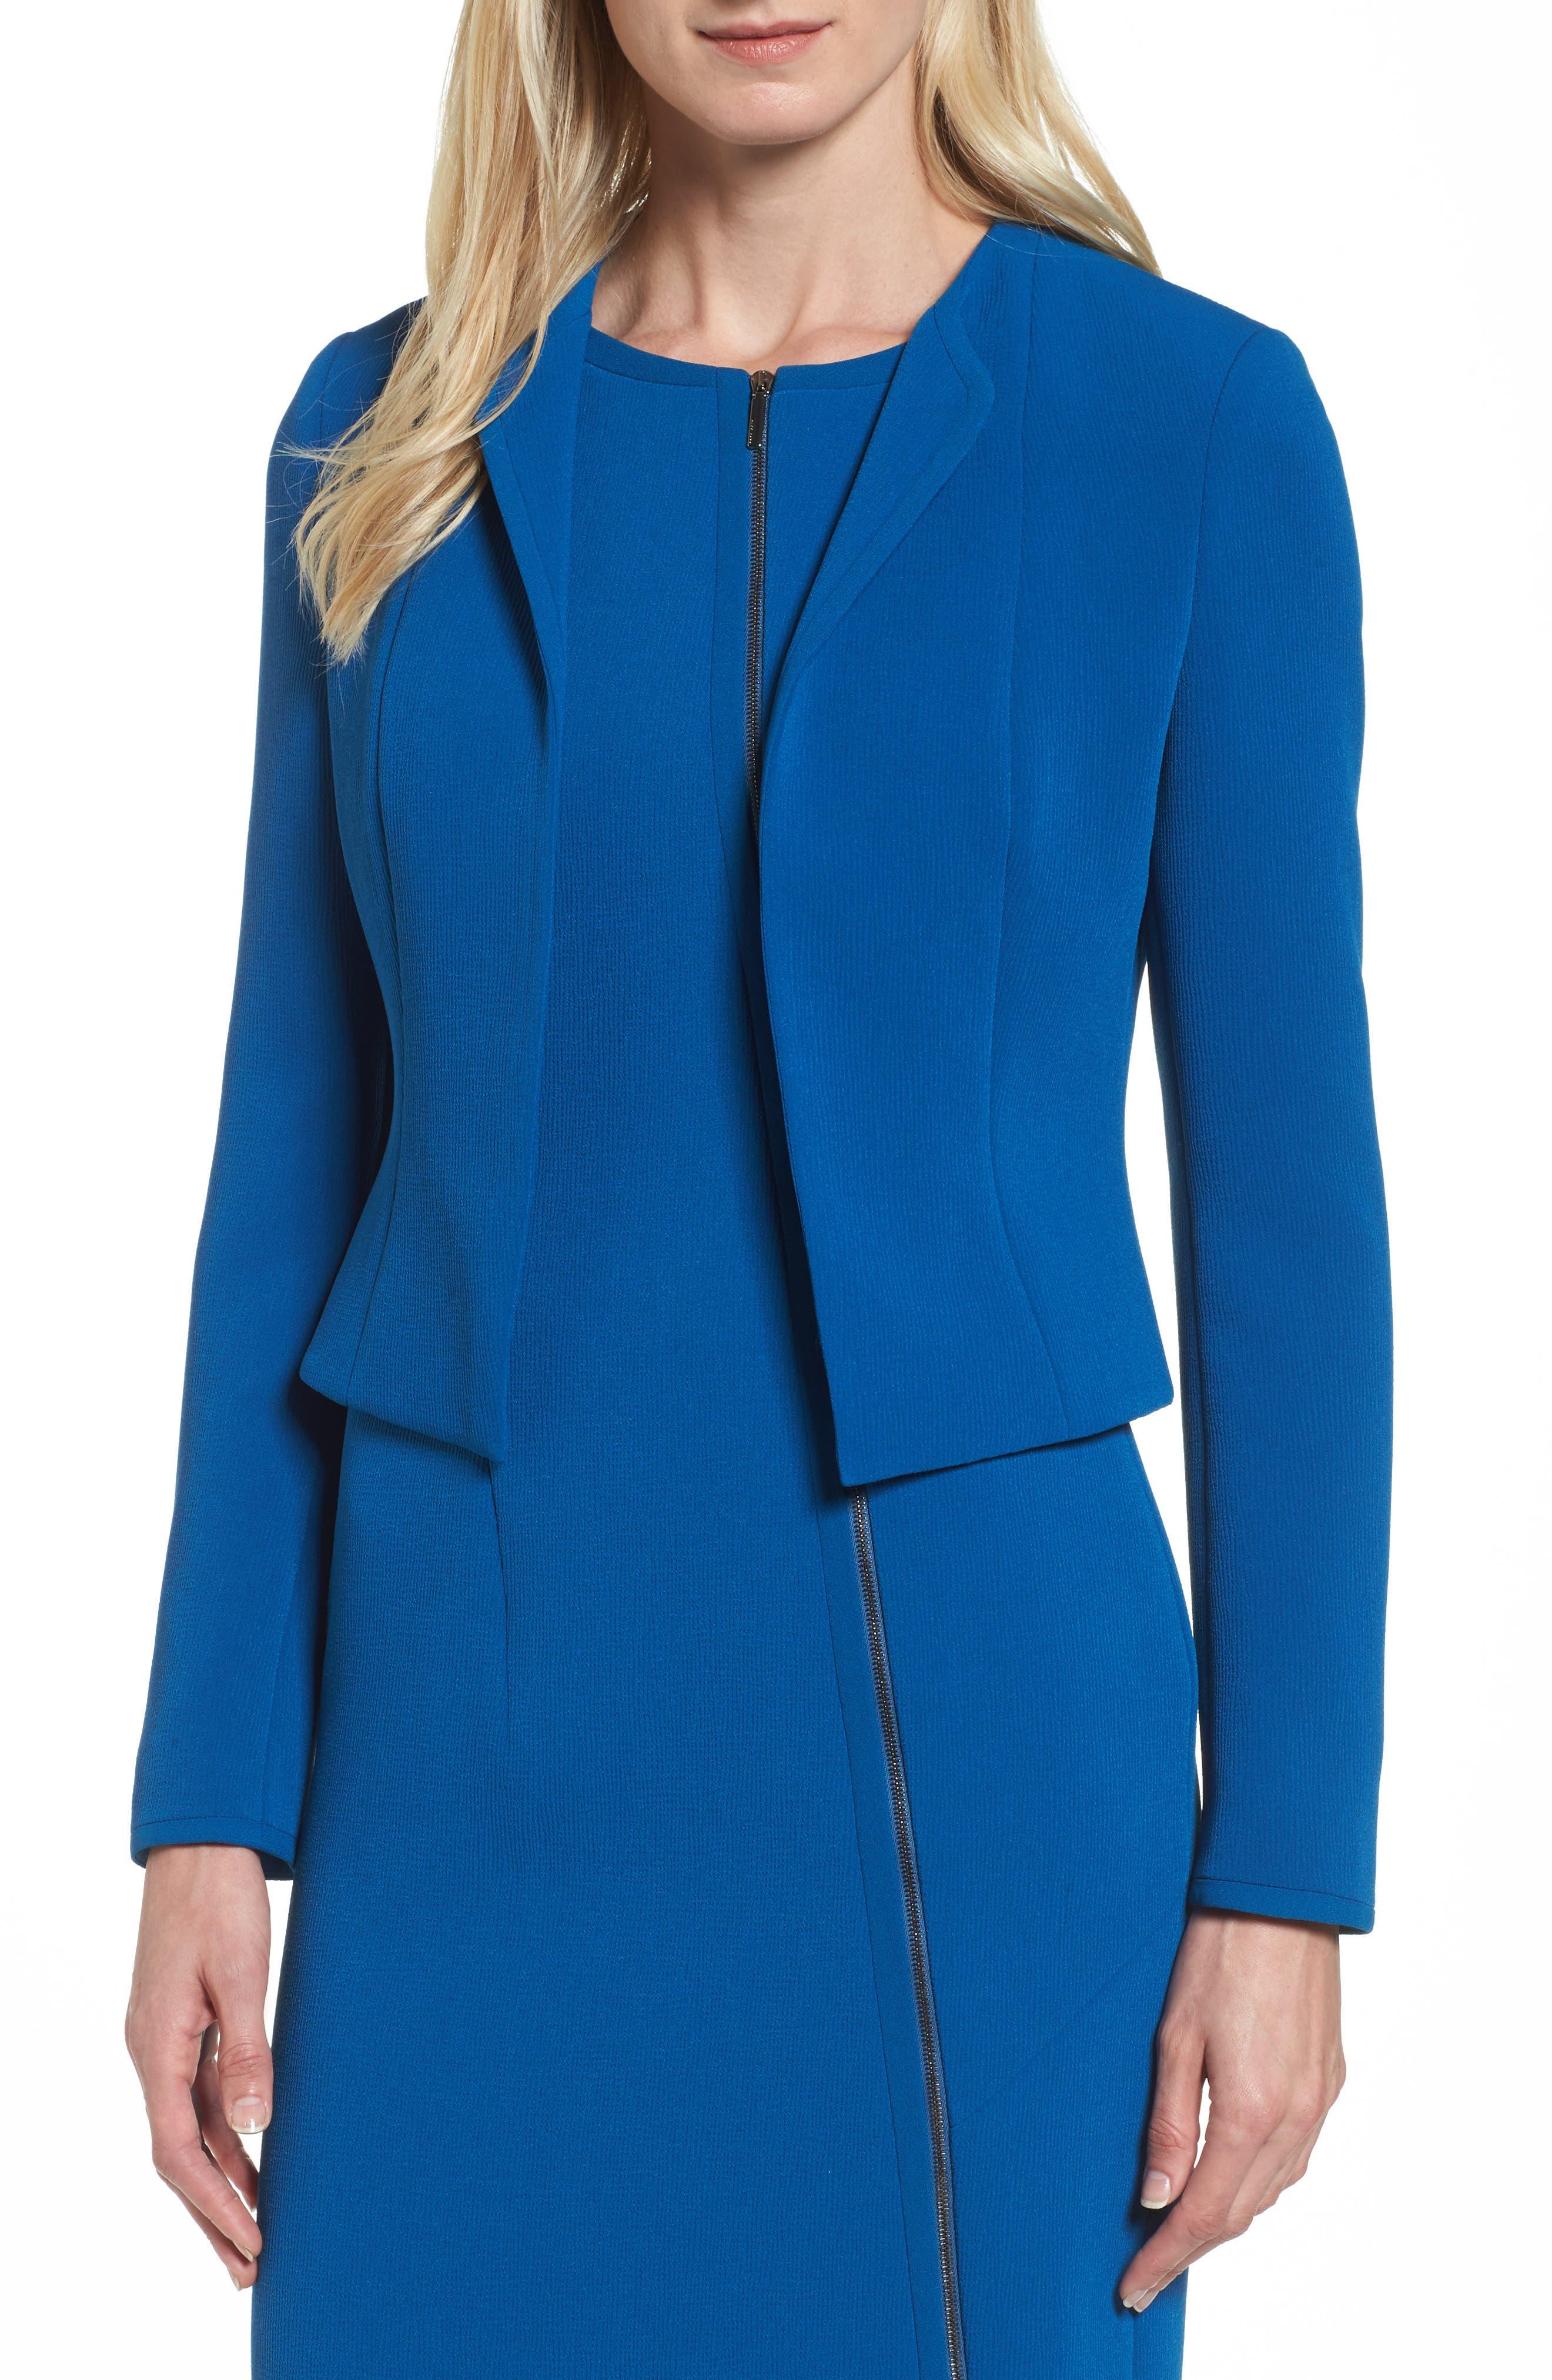 Alternate Image 1 Selected - BOSS Jerusa Crop Suit Jacket (Petite) (Nordstrom Exclusive)